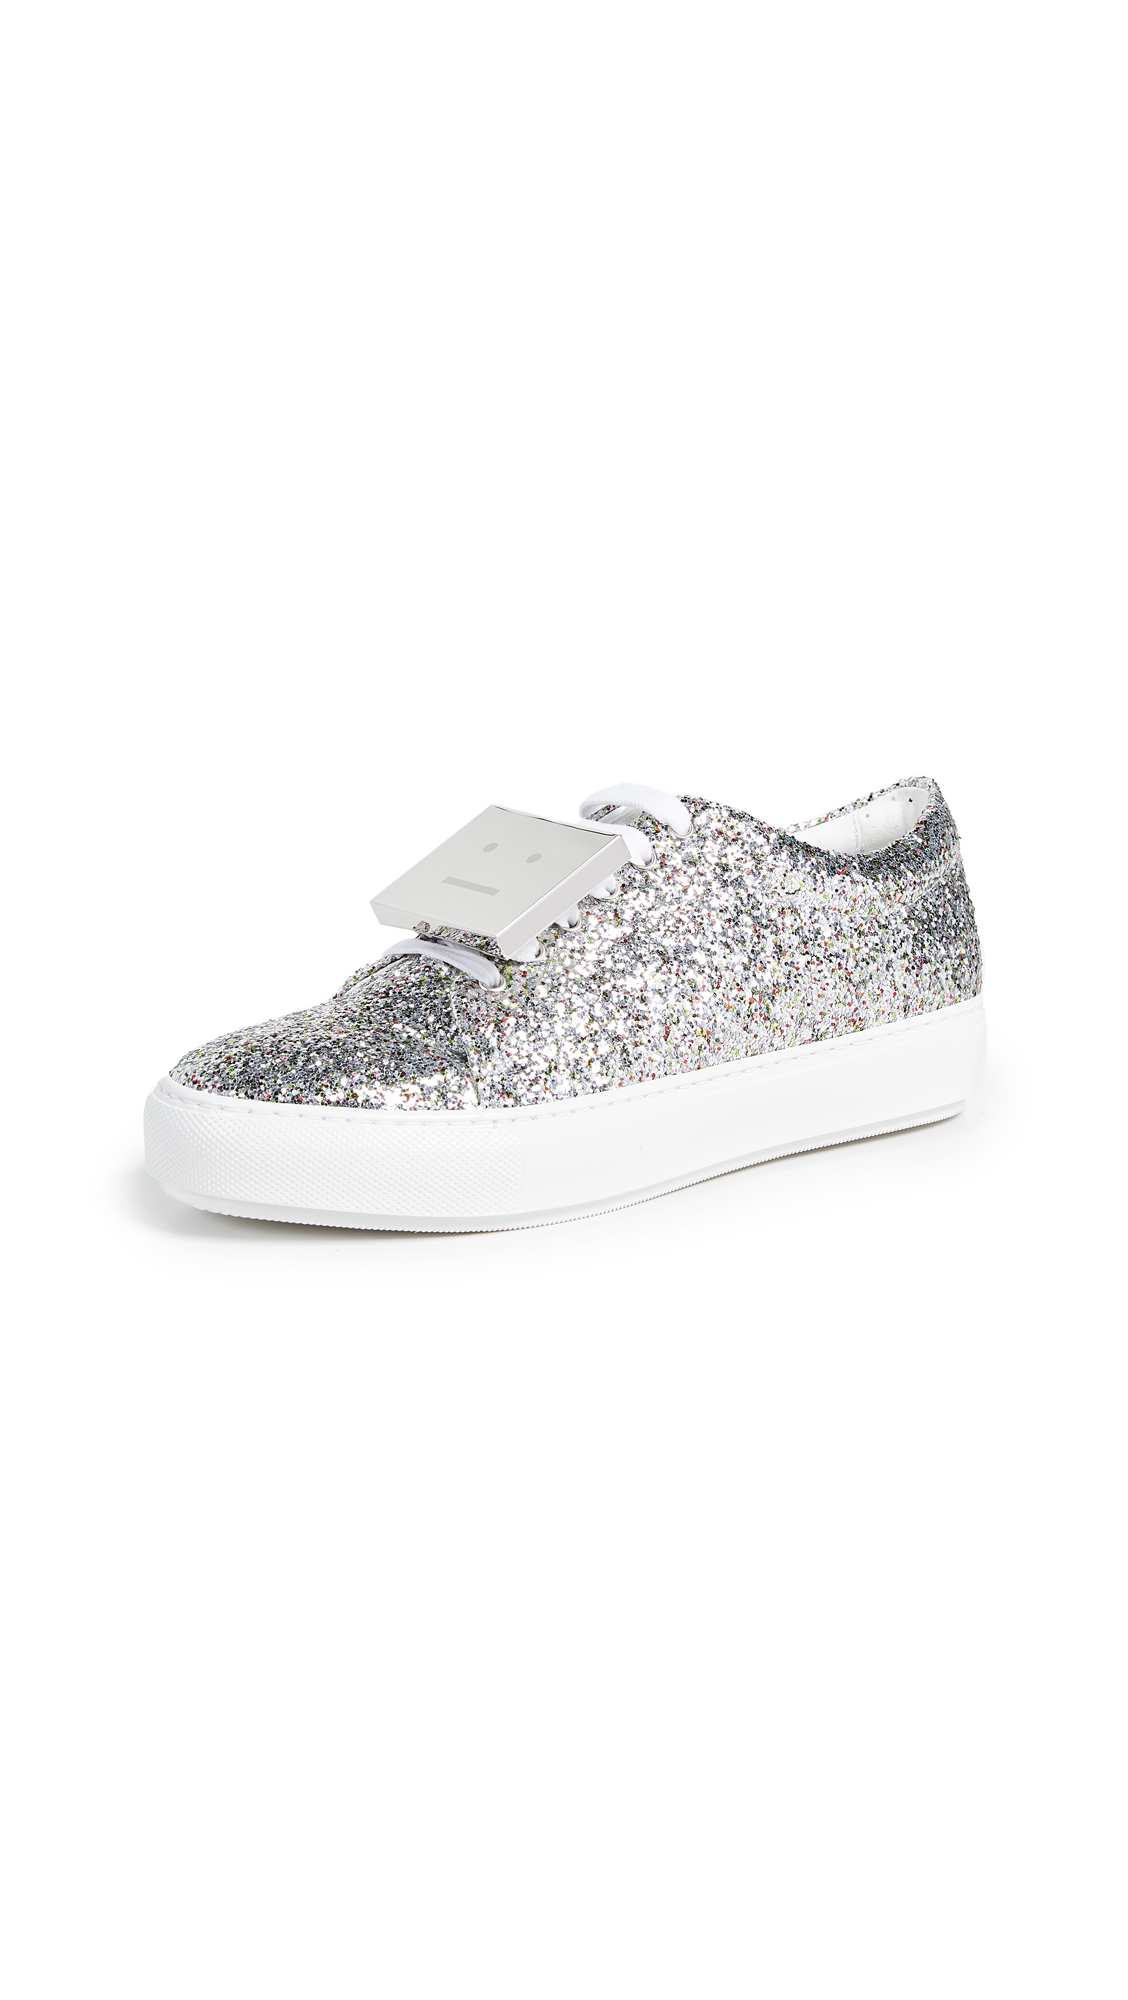 Acne Studios Adriana Spark Sneakers - Silver